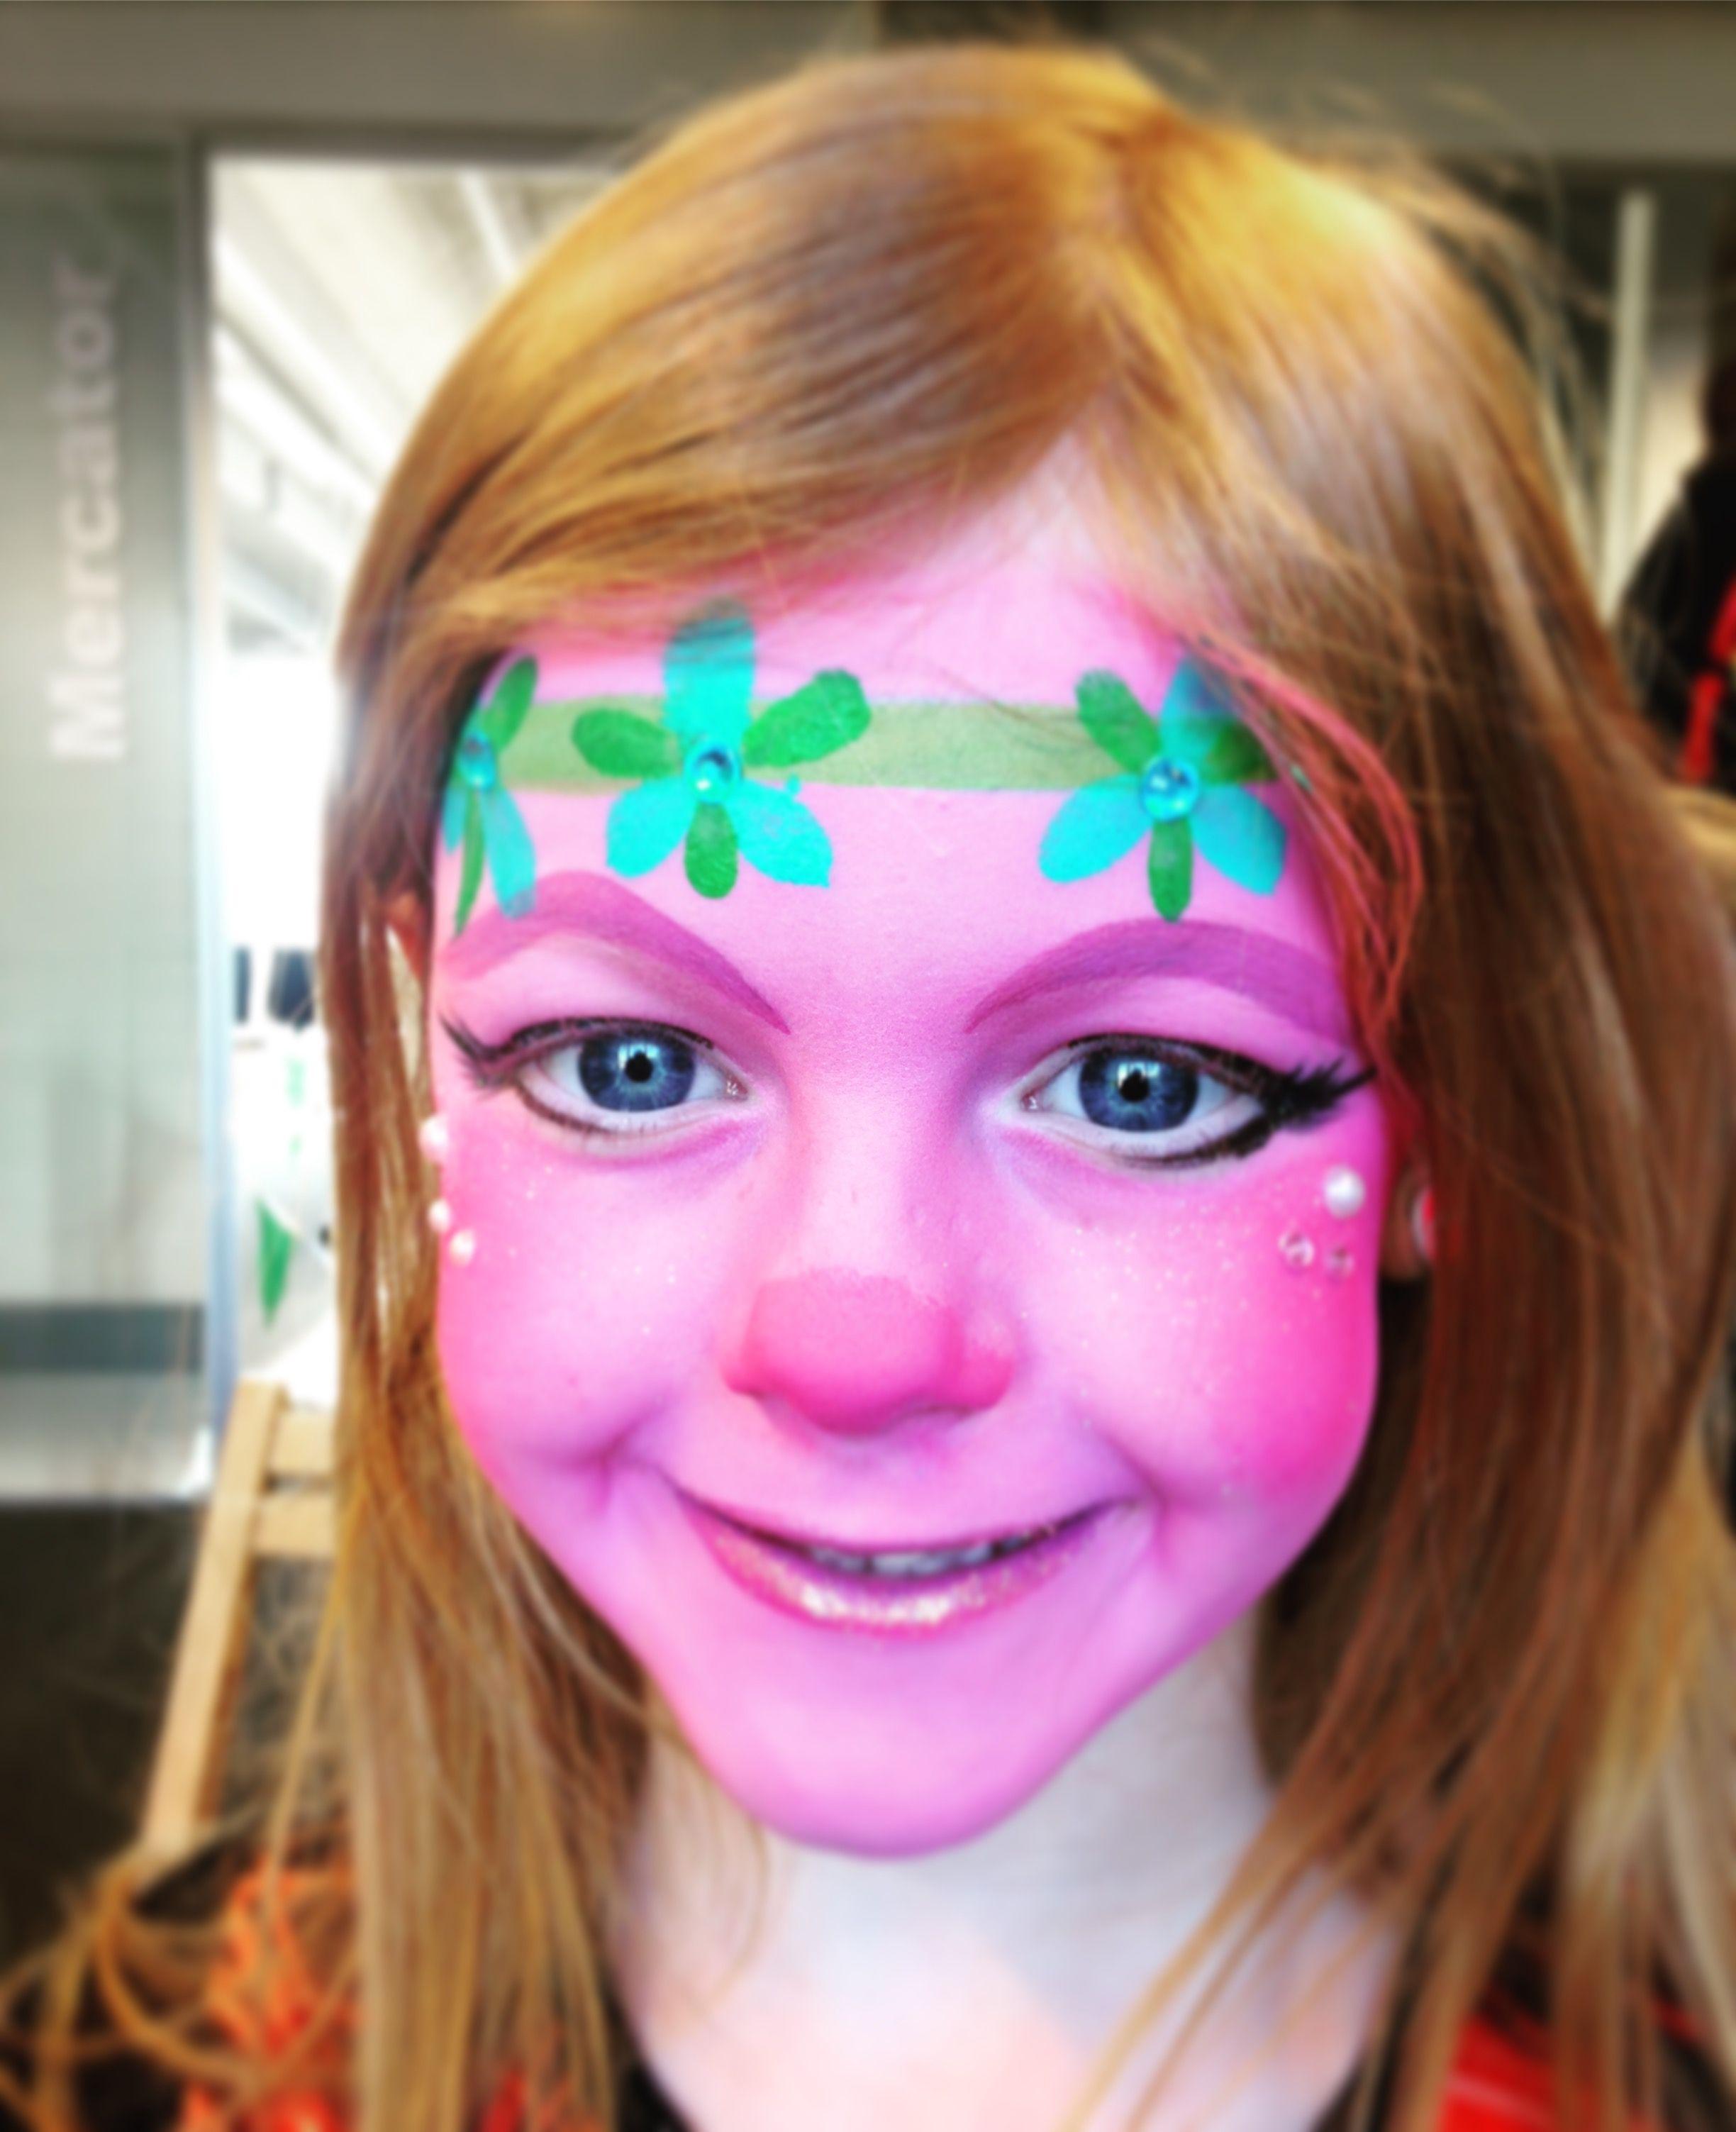 Troll poppy facepaint | Face painting | Pinterest | Face paintings